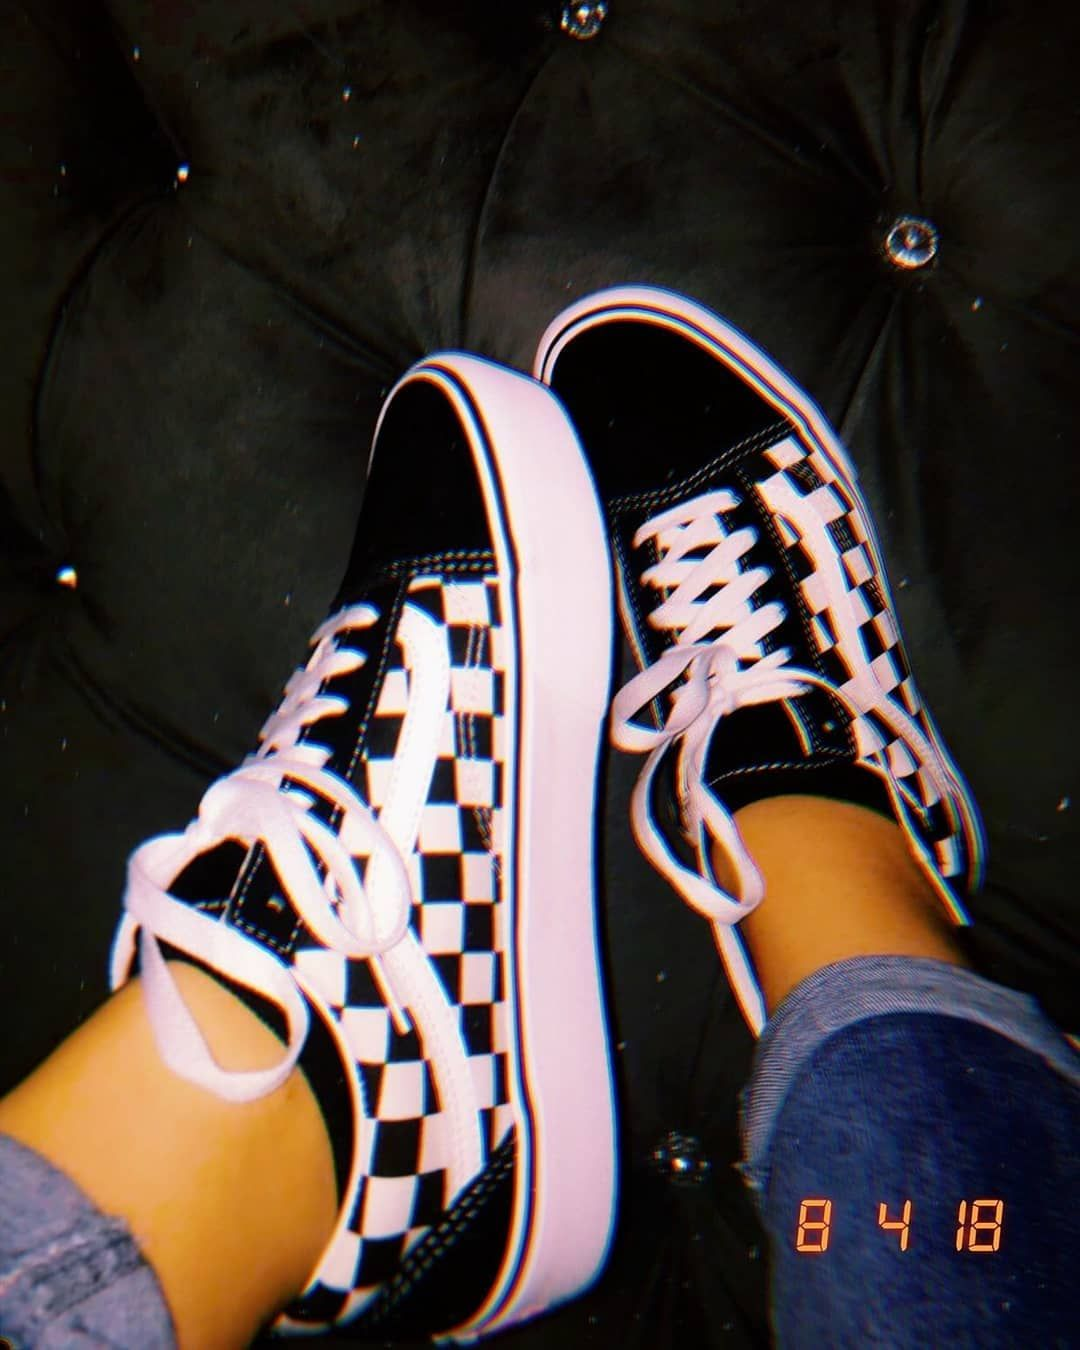 Tag a vans lover #shoes | Vans shoes, Sneakers, Sock shoes